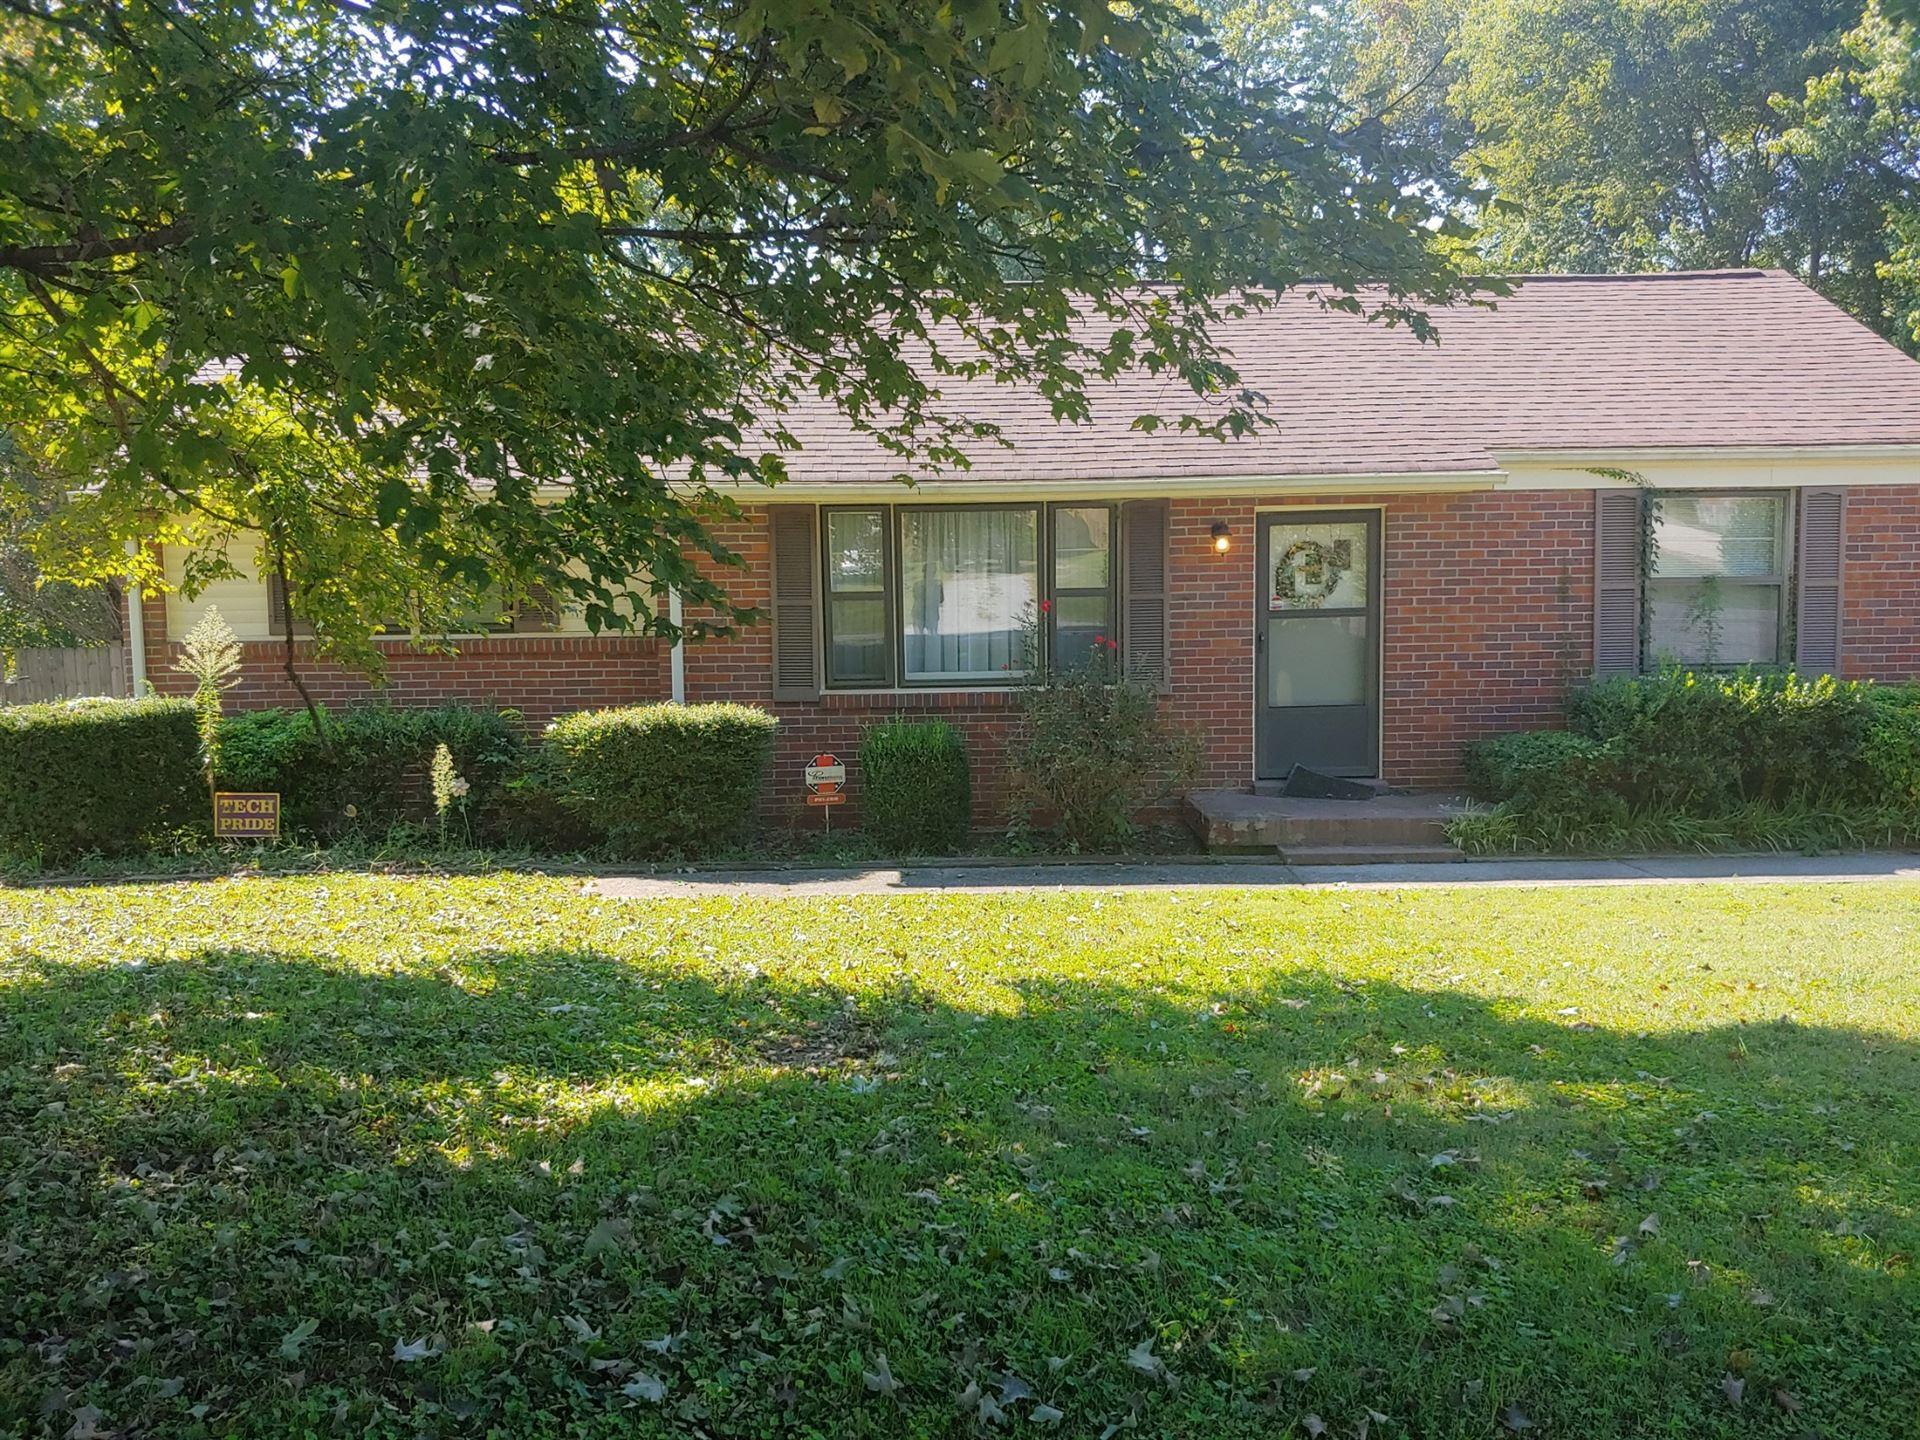 2923 Dunmore Dr, Nashville, TN 37214 - MLS#: 2301249